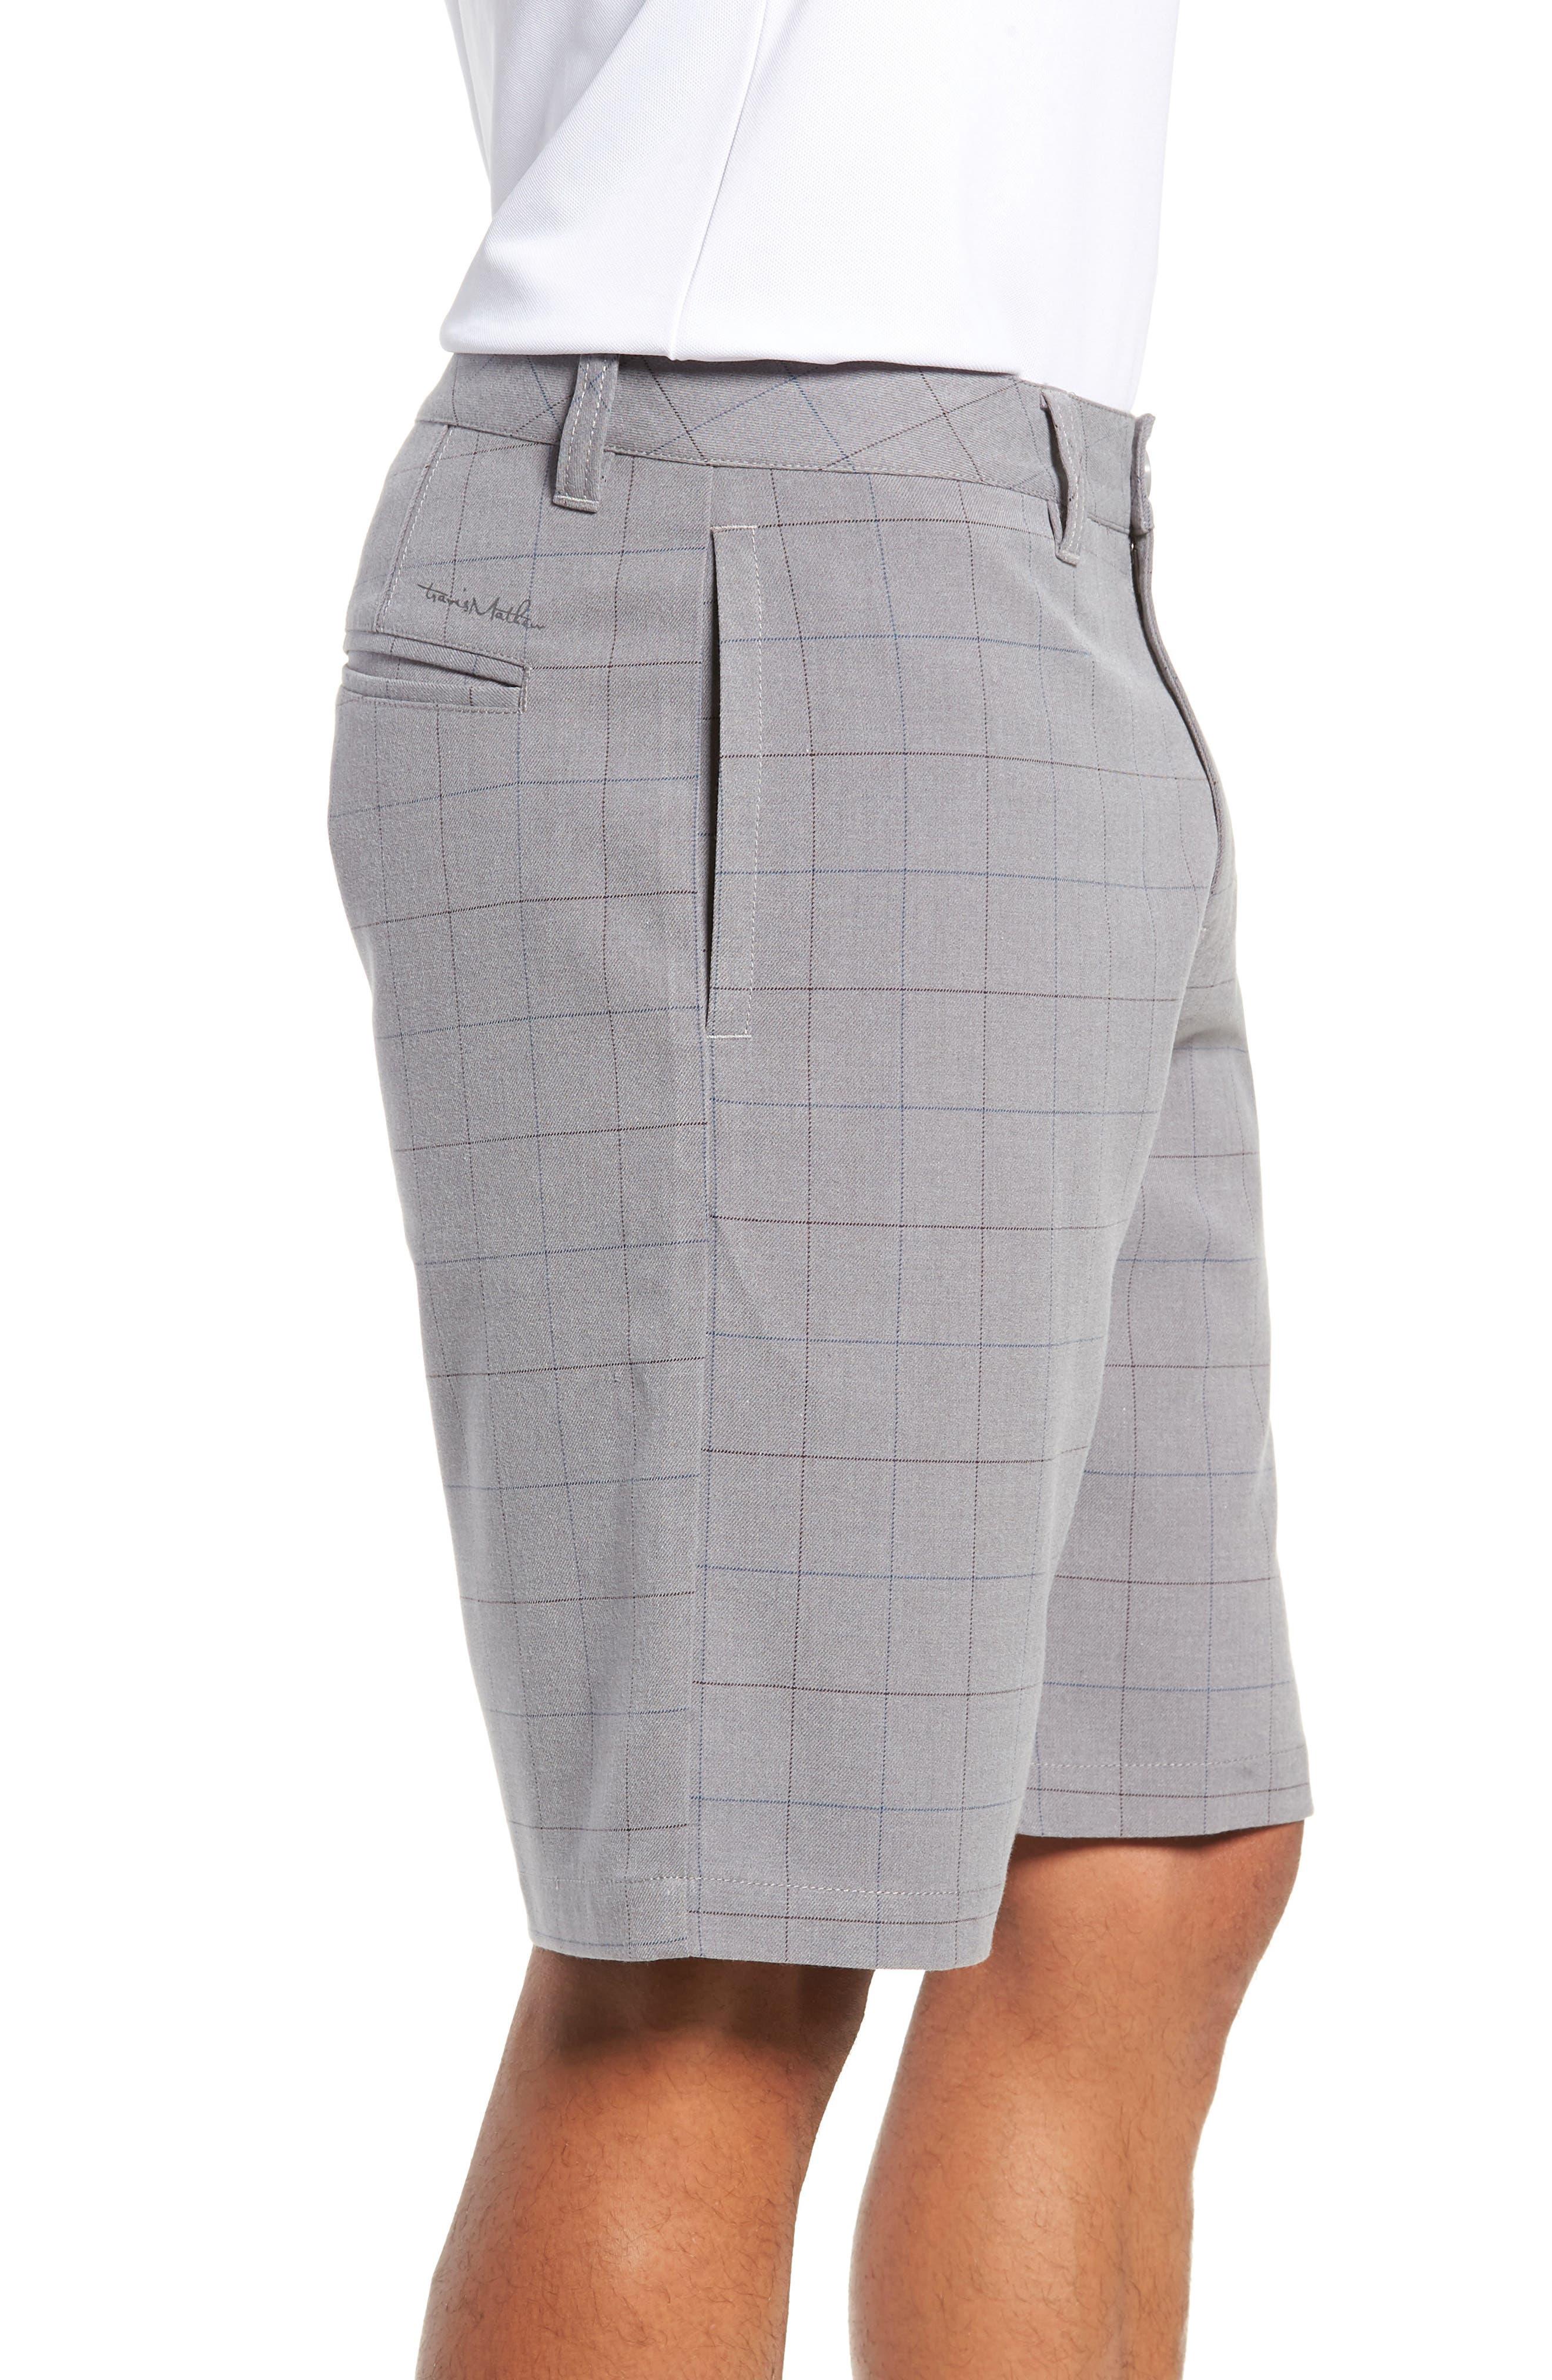 Rickles Regular Fit Shorts,                             Alternate thumbnail 3, color,                             HEATHER SHARKSKIN